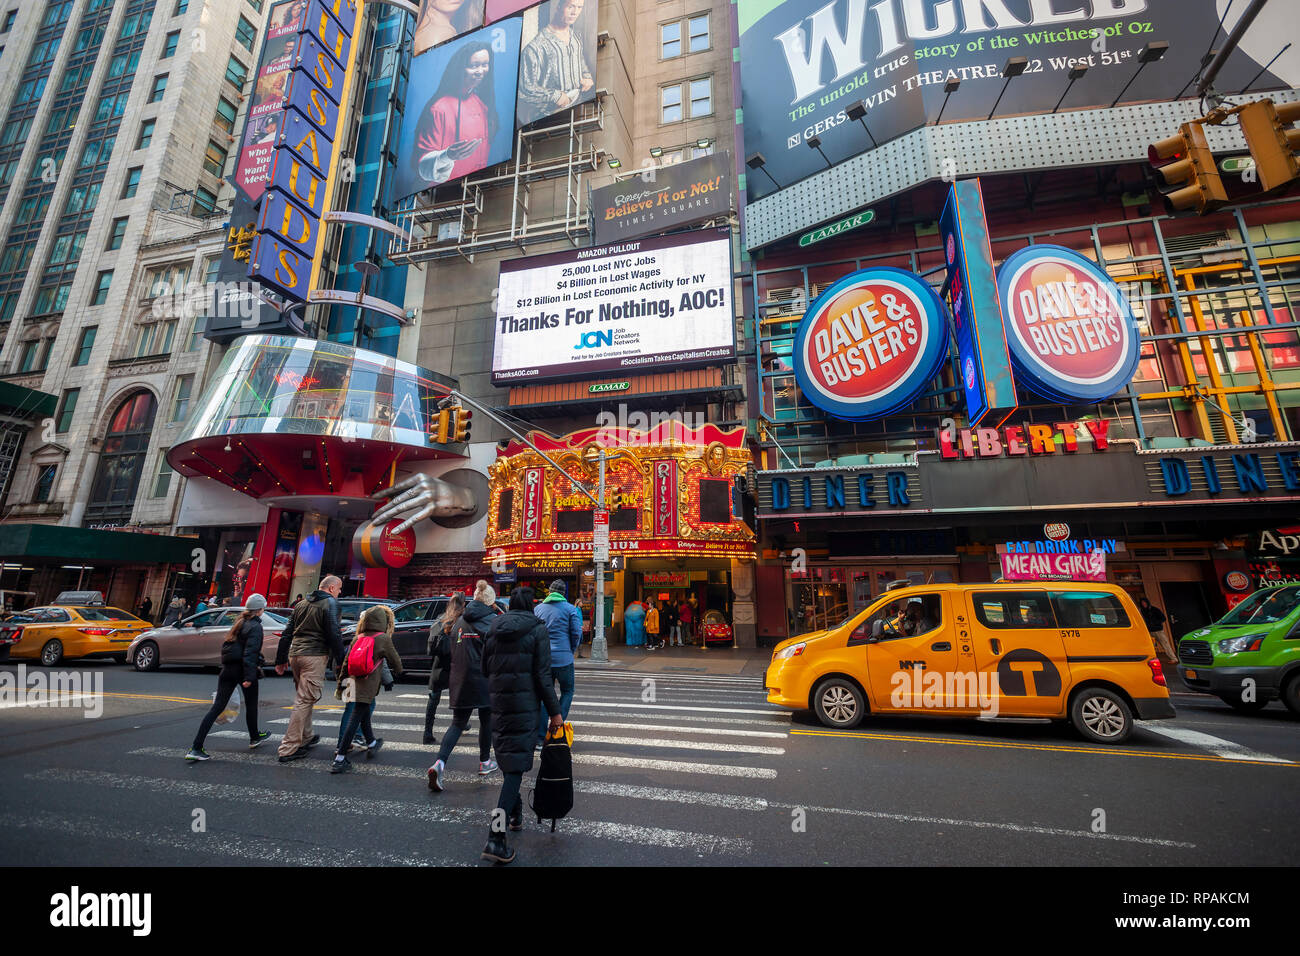 New York, USA  21st Feb 2019  An electronic billboard in Times